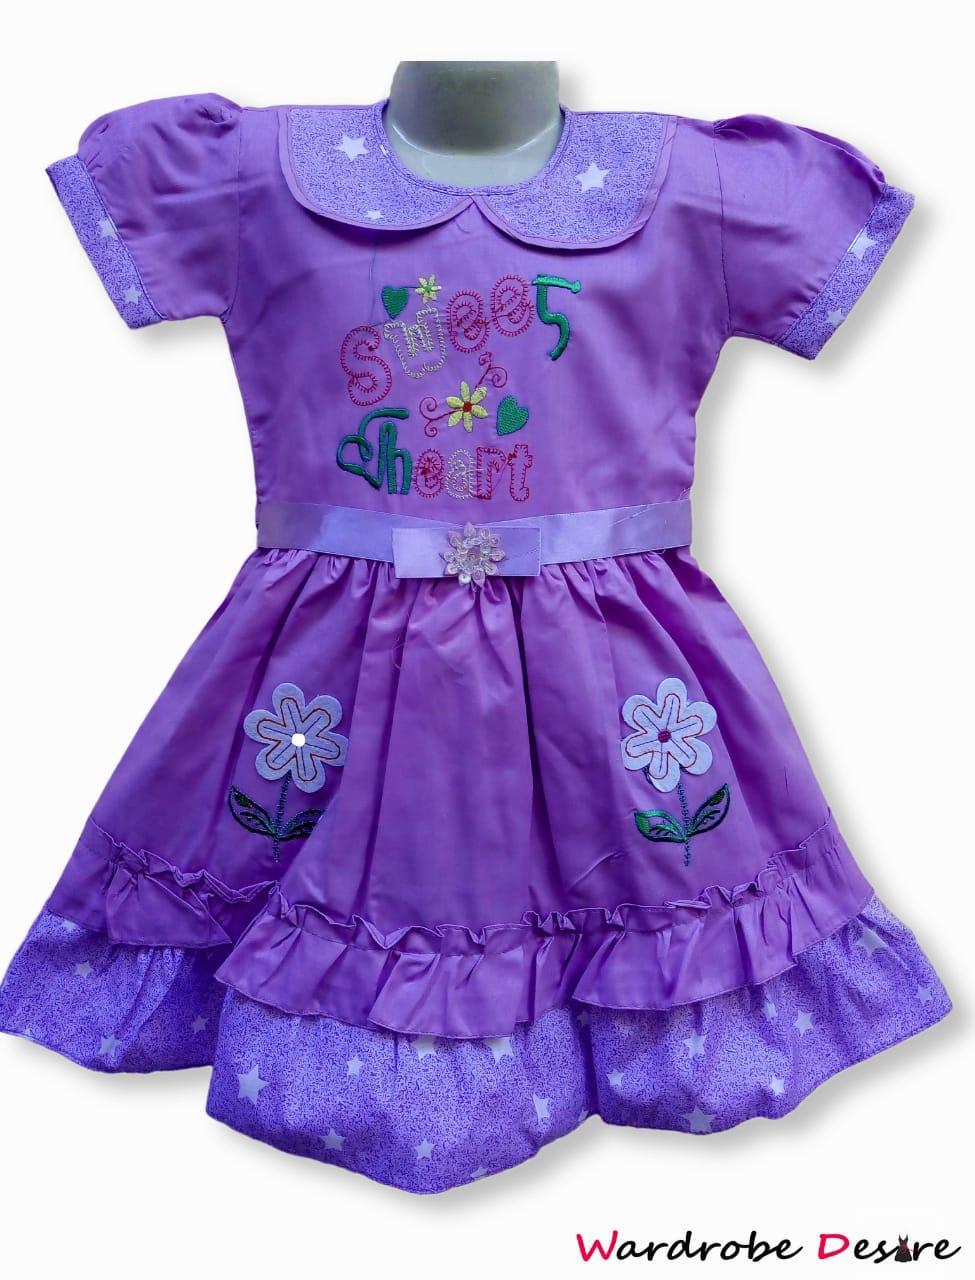 Wardrobe Desire Casual Wear Purple Violet Cotton Fibroin Ruffle Frock for Girls-4 to 8 Years